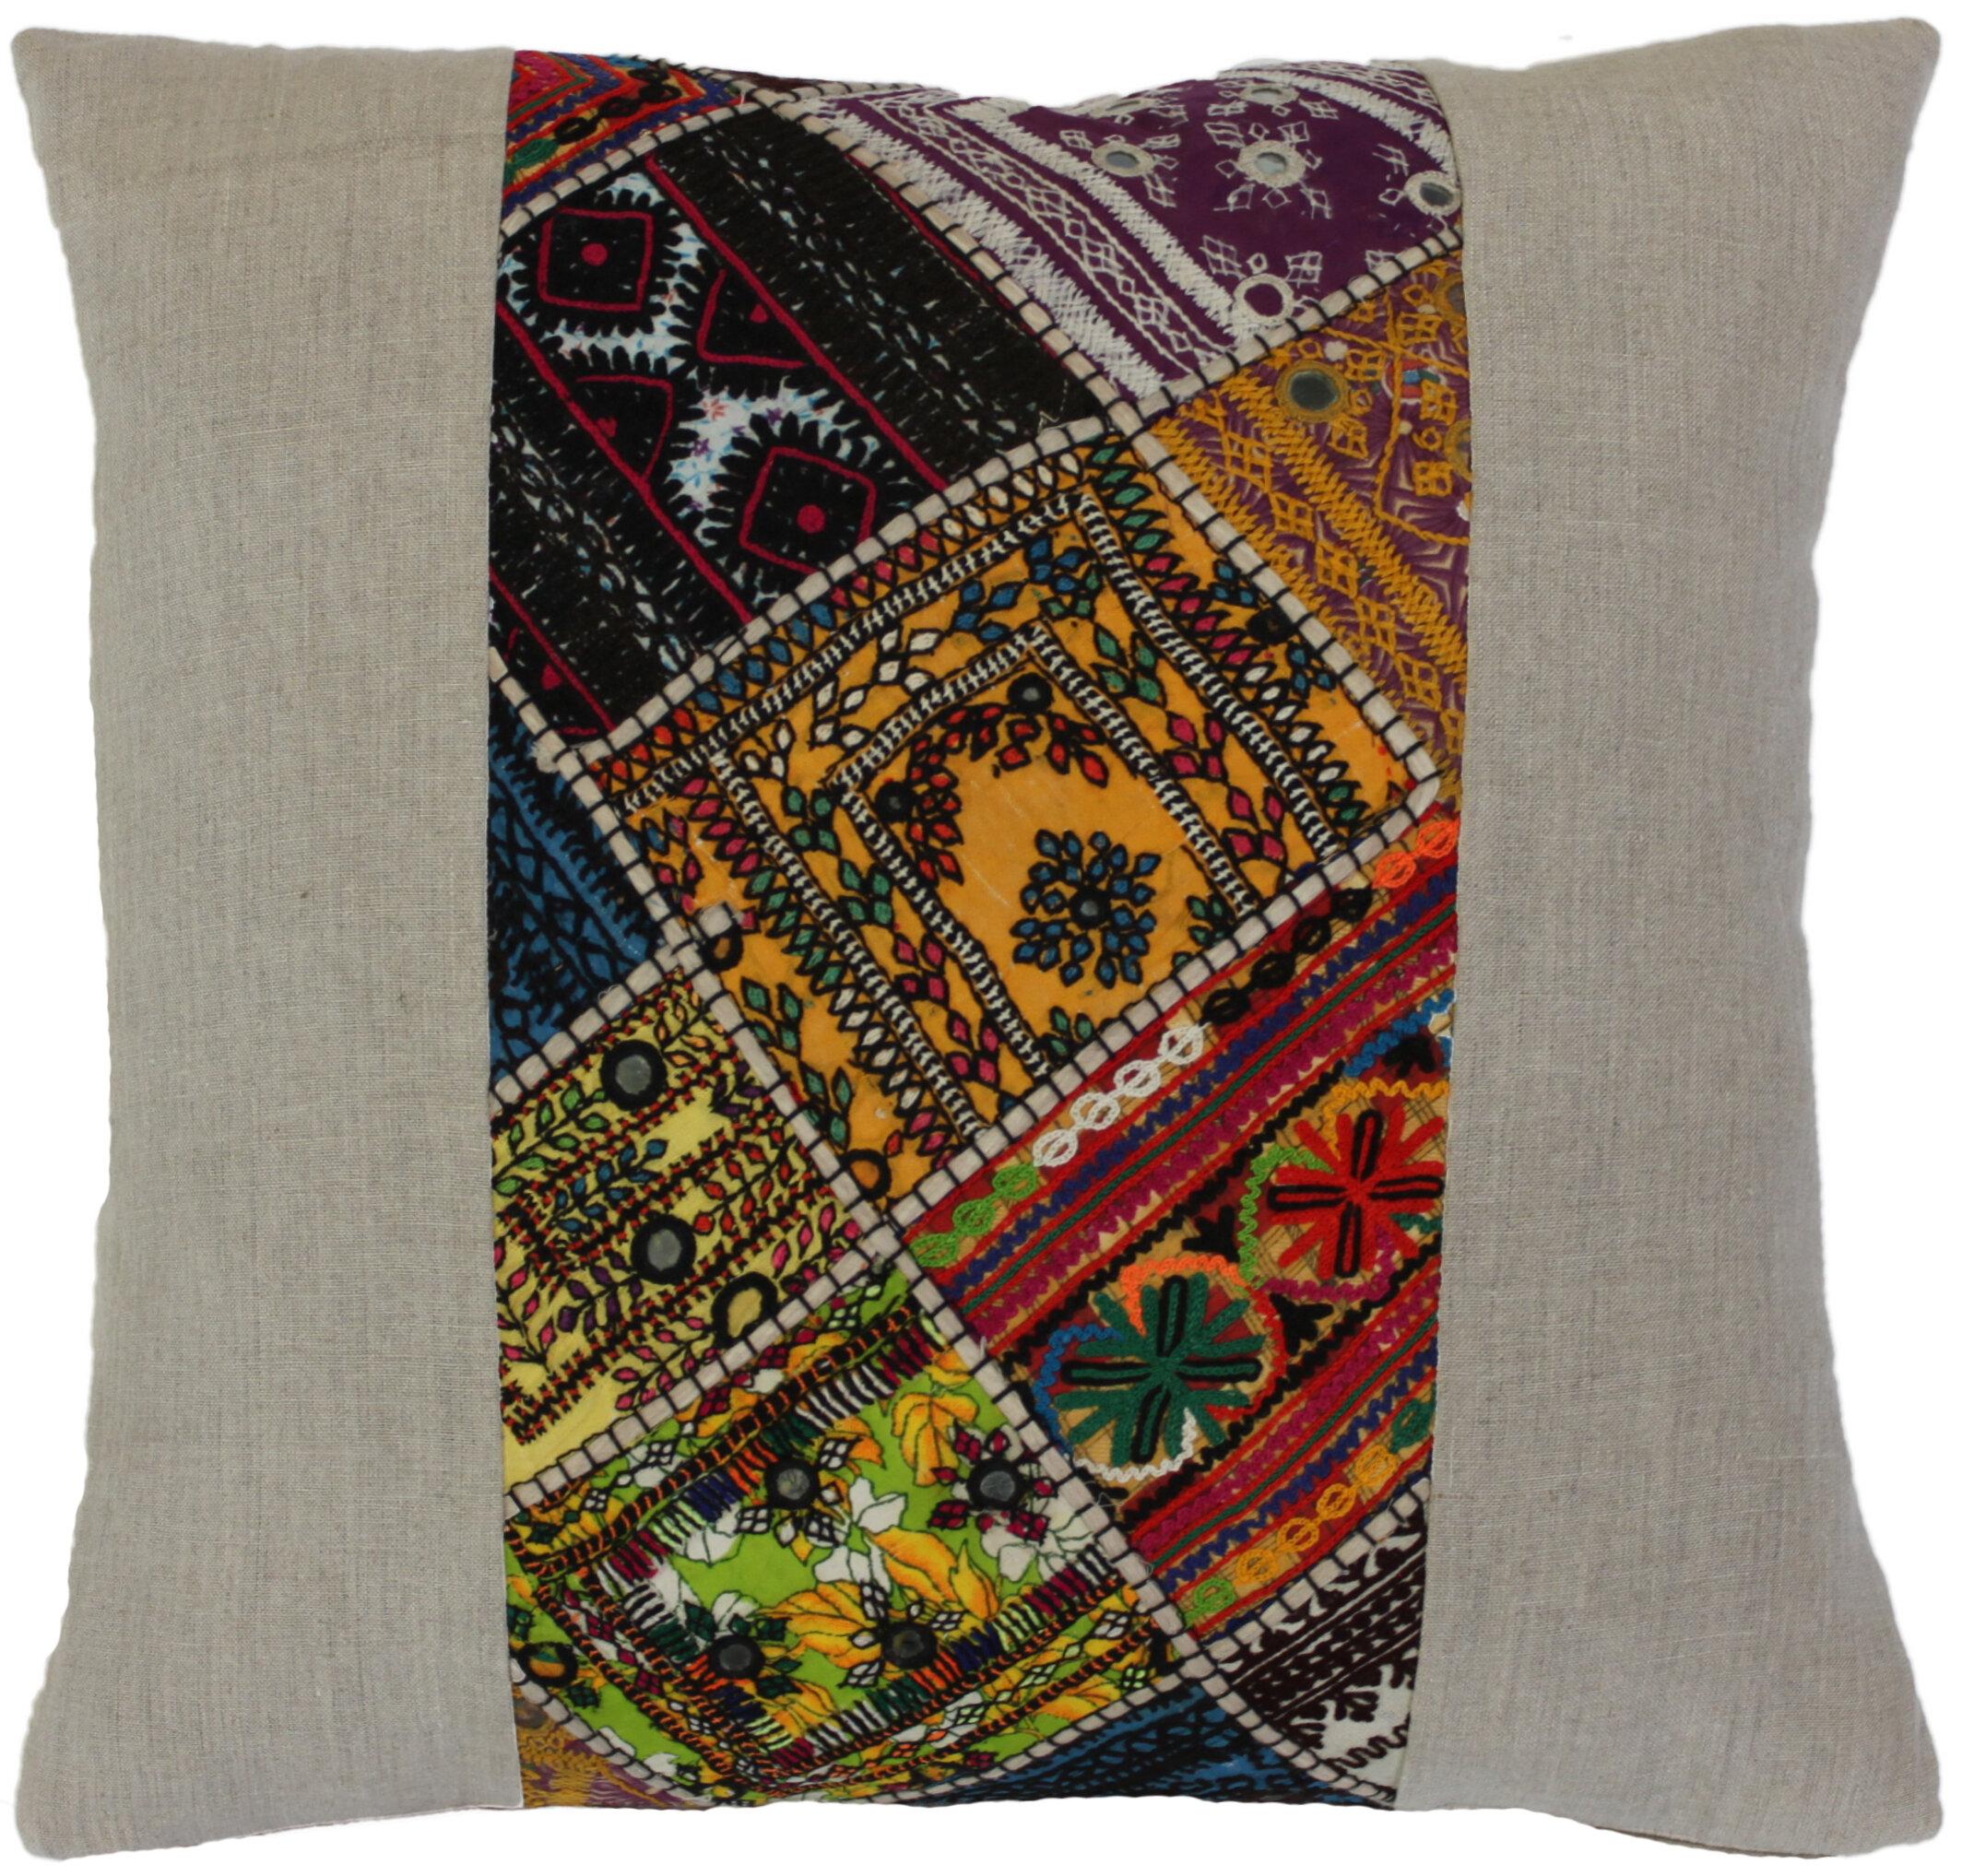 Sabira Throw Pillows You Ll Love In 2021 Wayfair